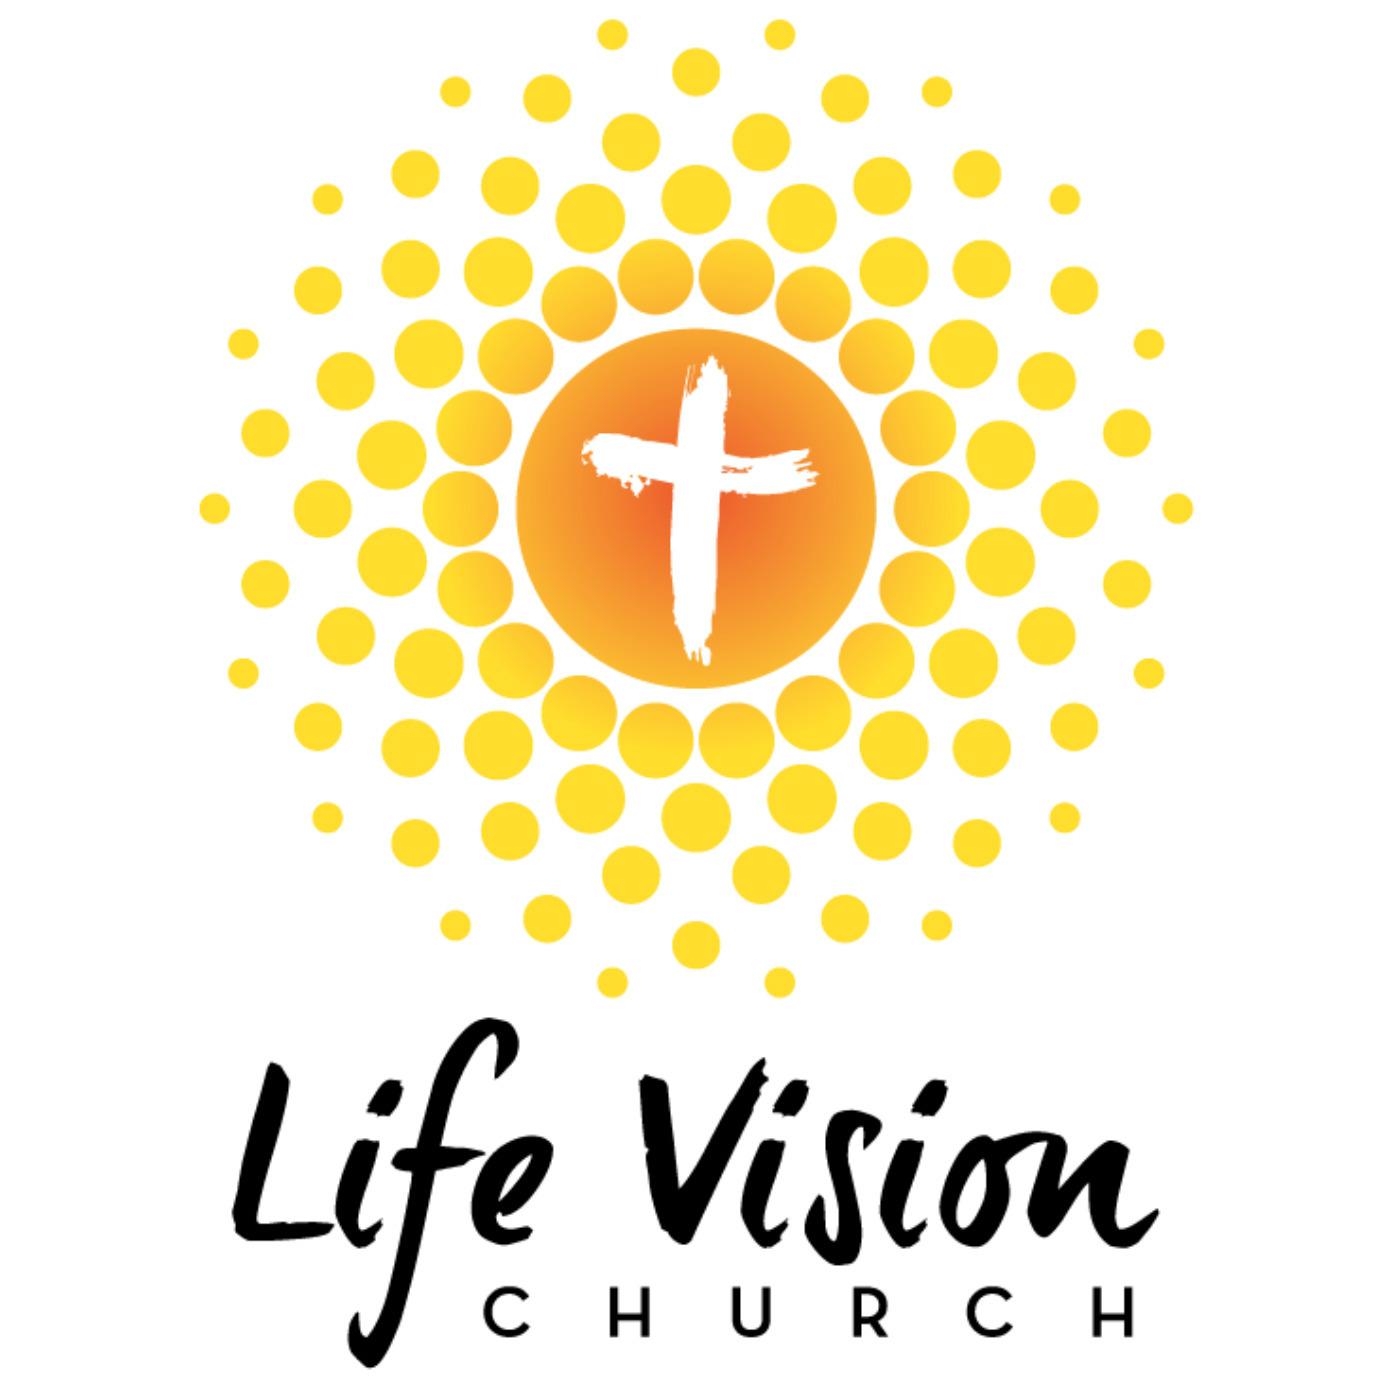 Life Vision Church